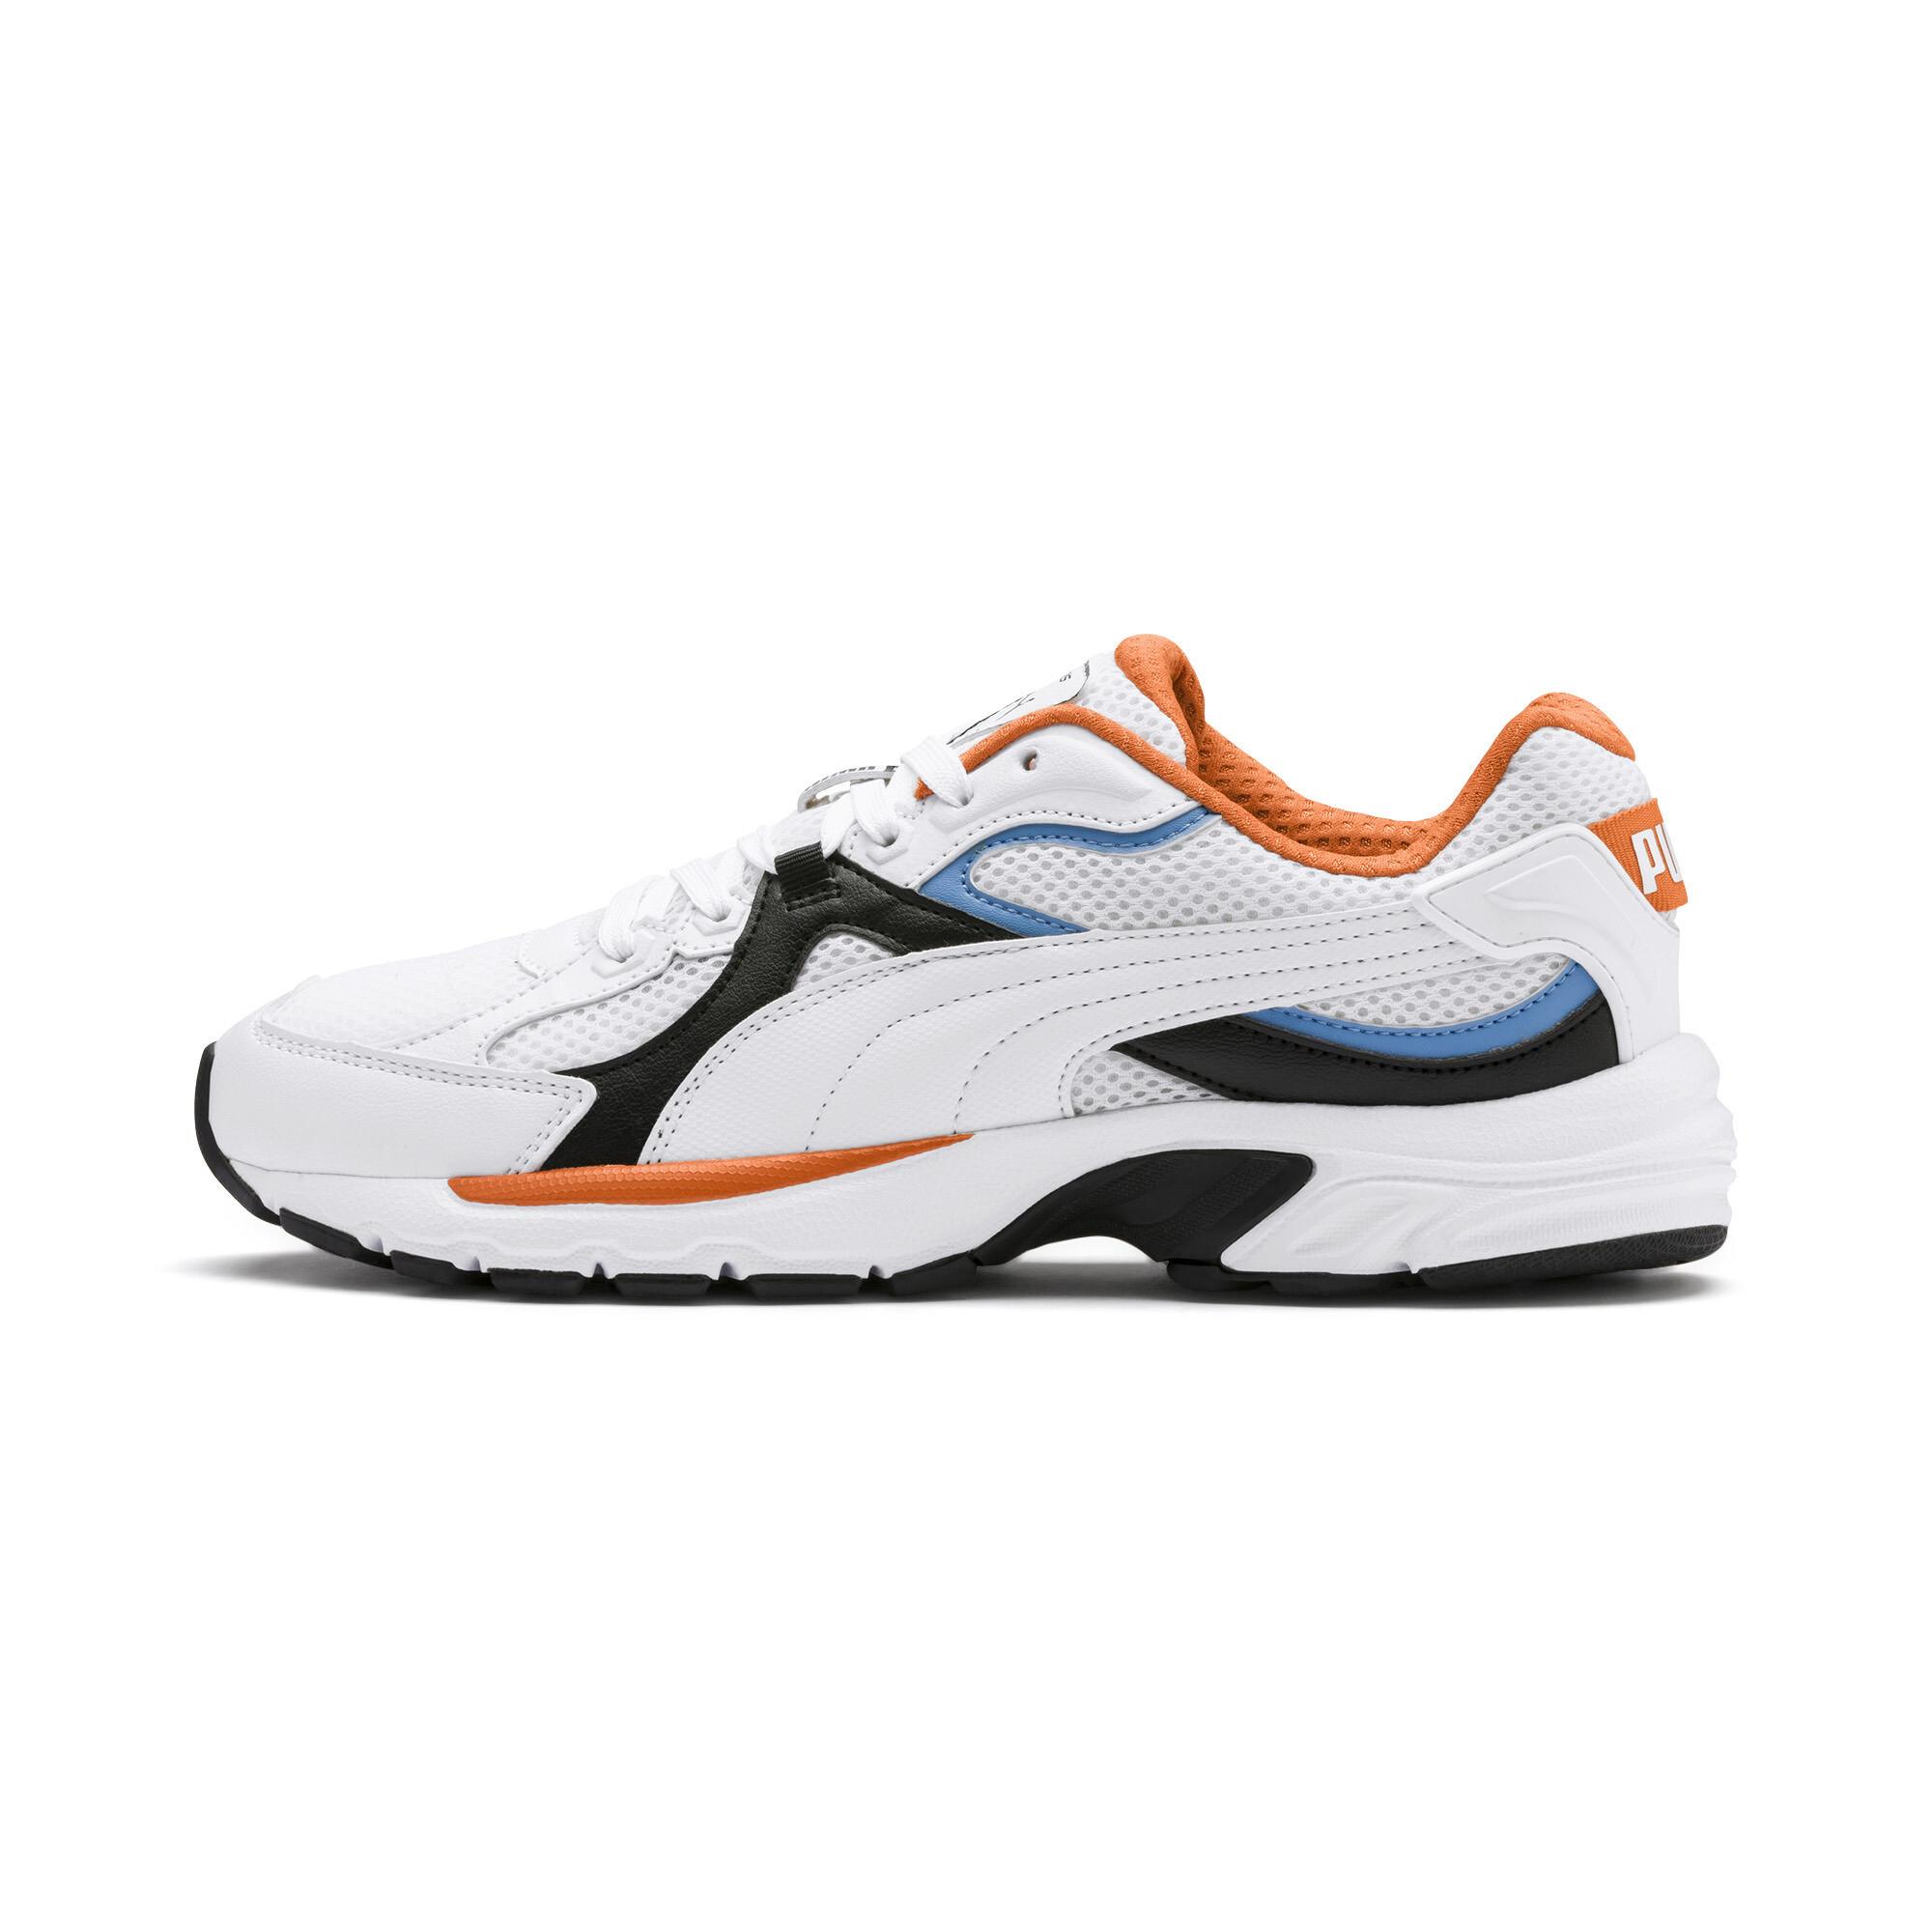 PUMA-Axis-Plus-90s-Sneakers-Men-Shoe-Basics thumbnail 17